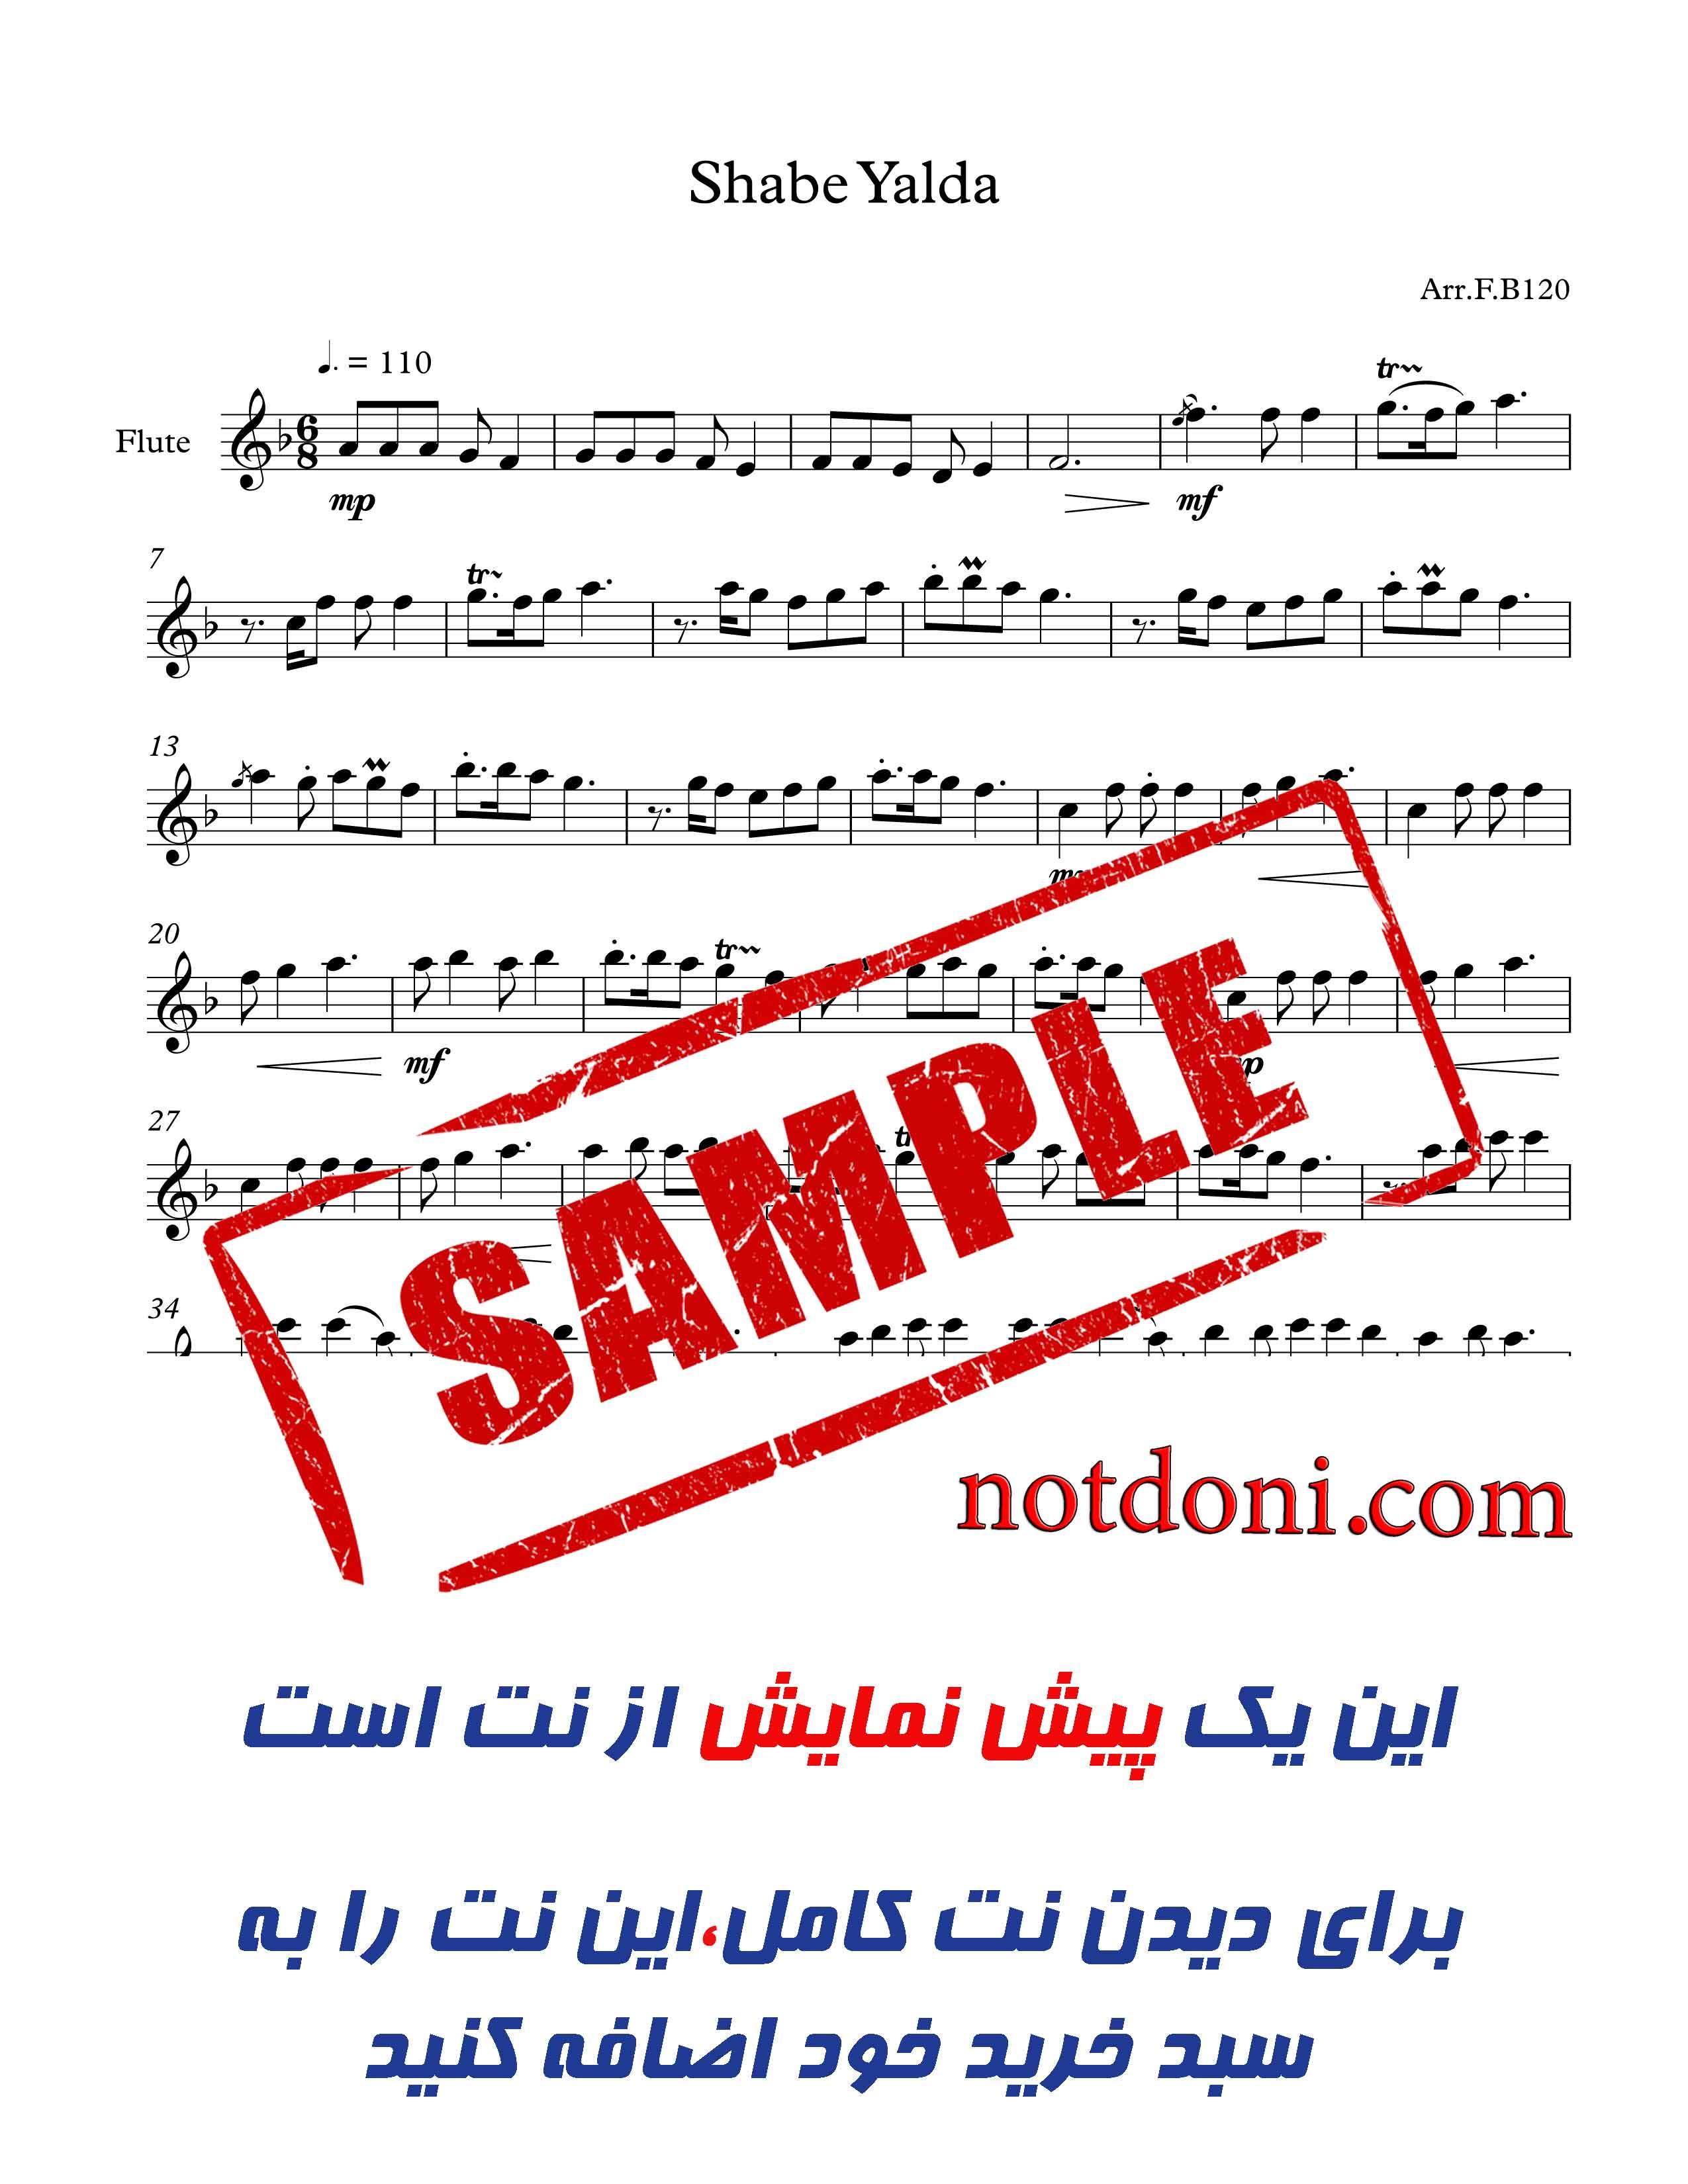 2c9dd7bd-8c59-4a7b-a7f3-e90cabe9c0a9_Shabe-Yalda-Flute.jpg